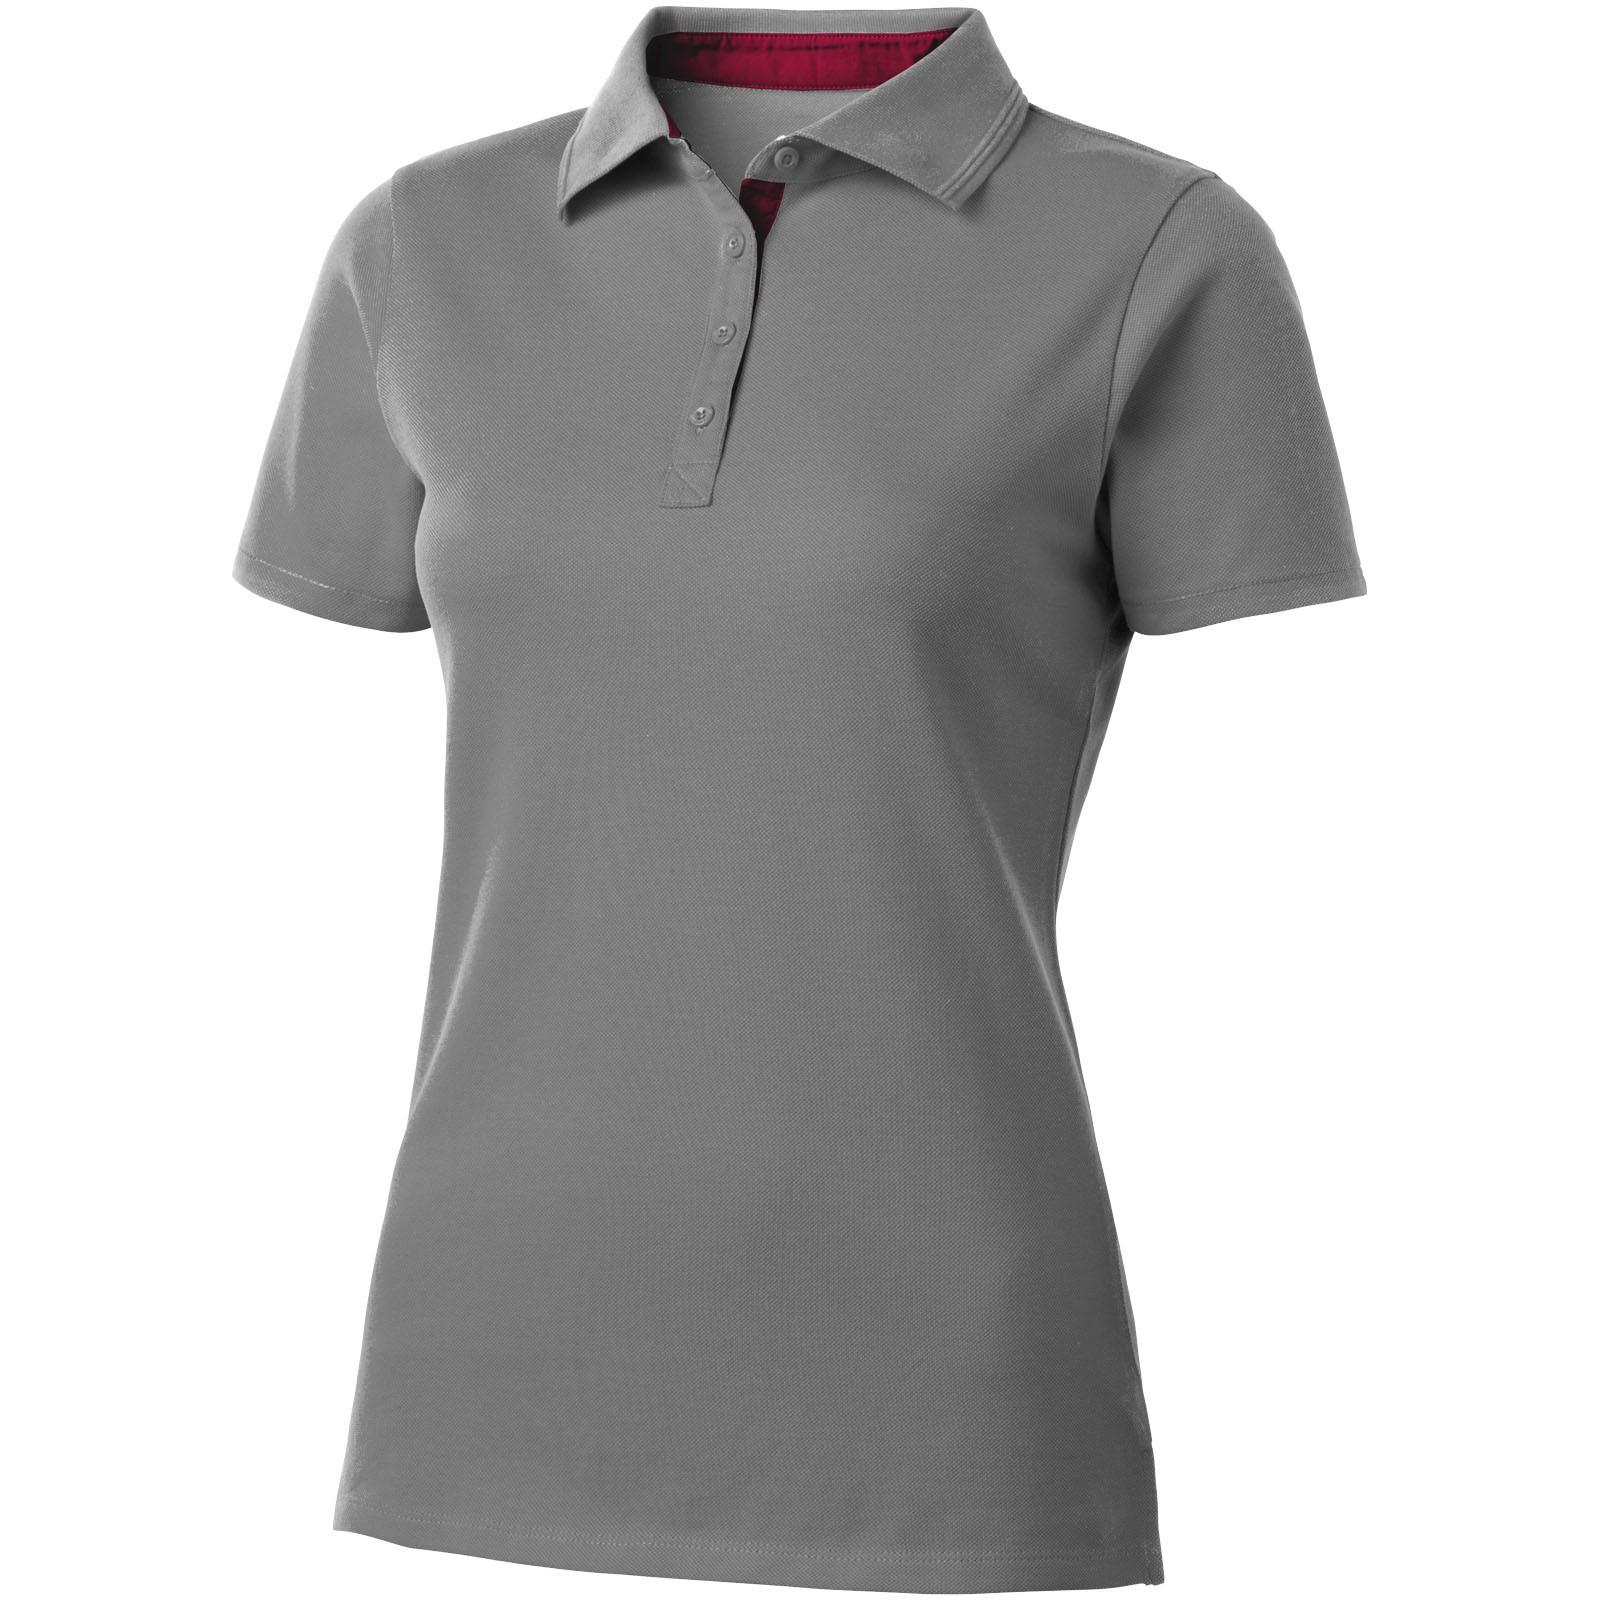 Hacker Poloshirt für Damen - Grau / Rot / XL